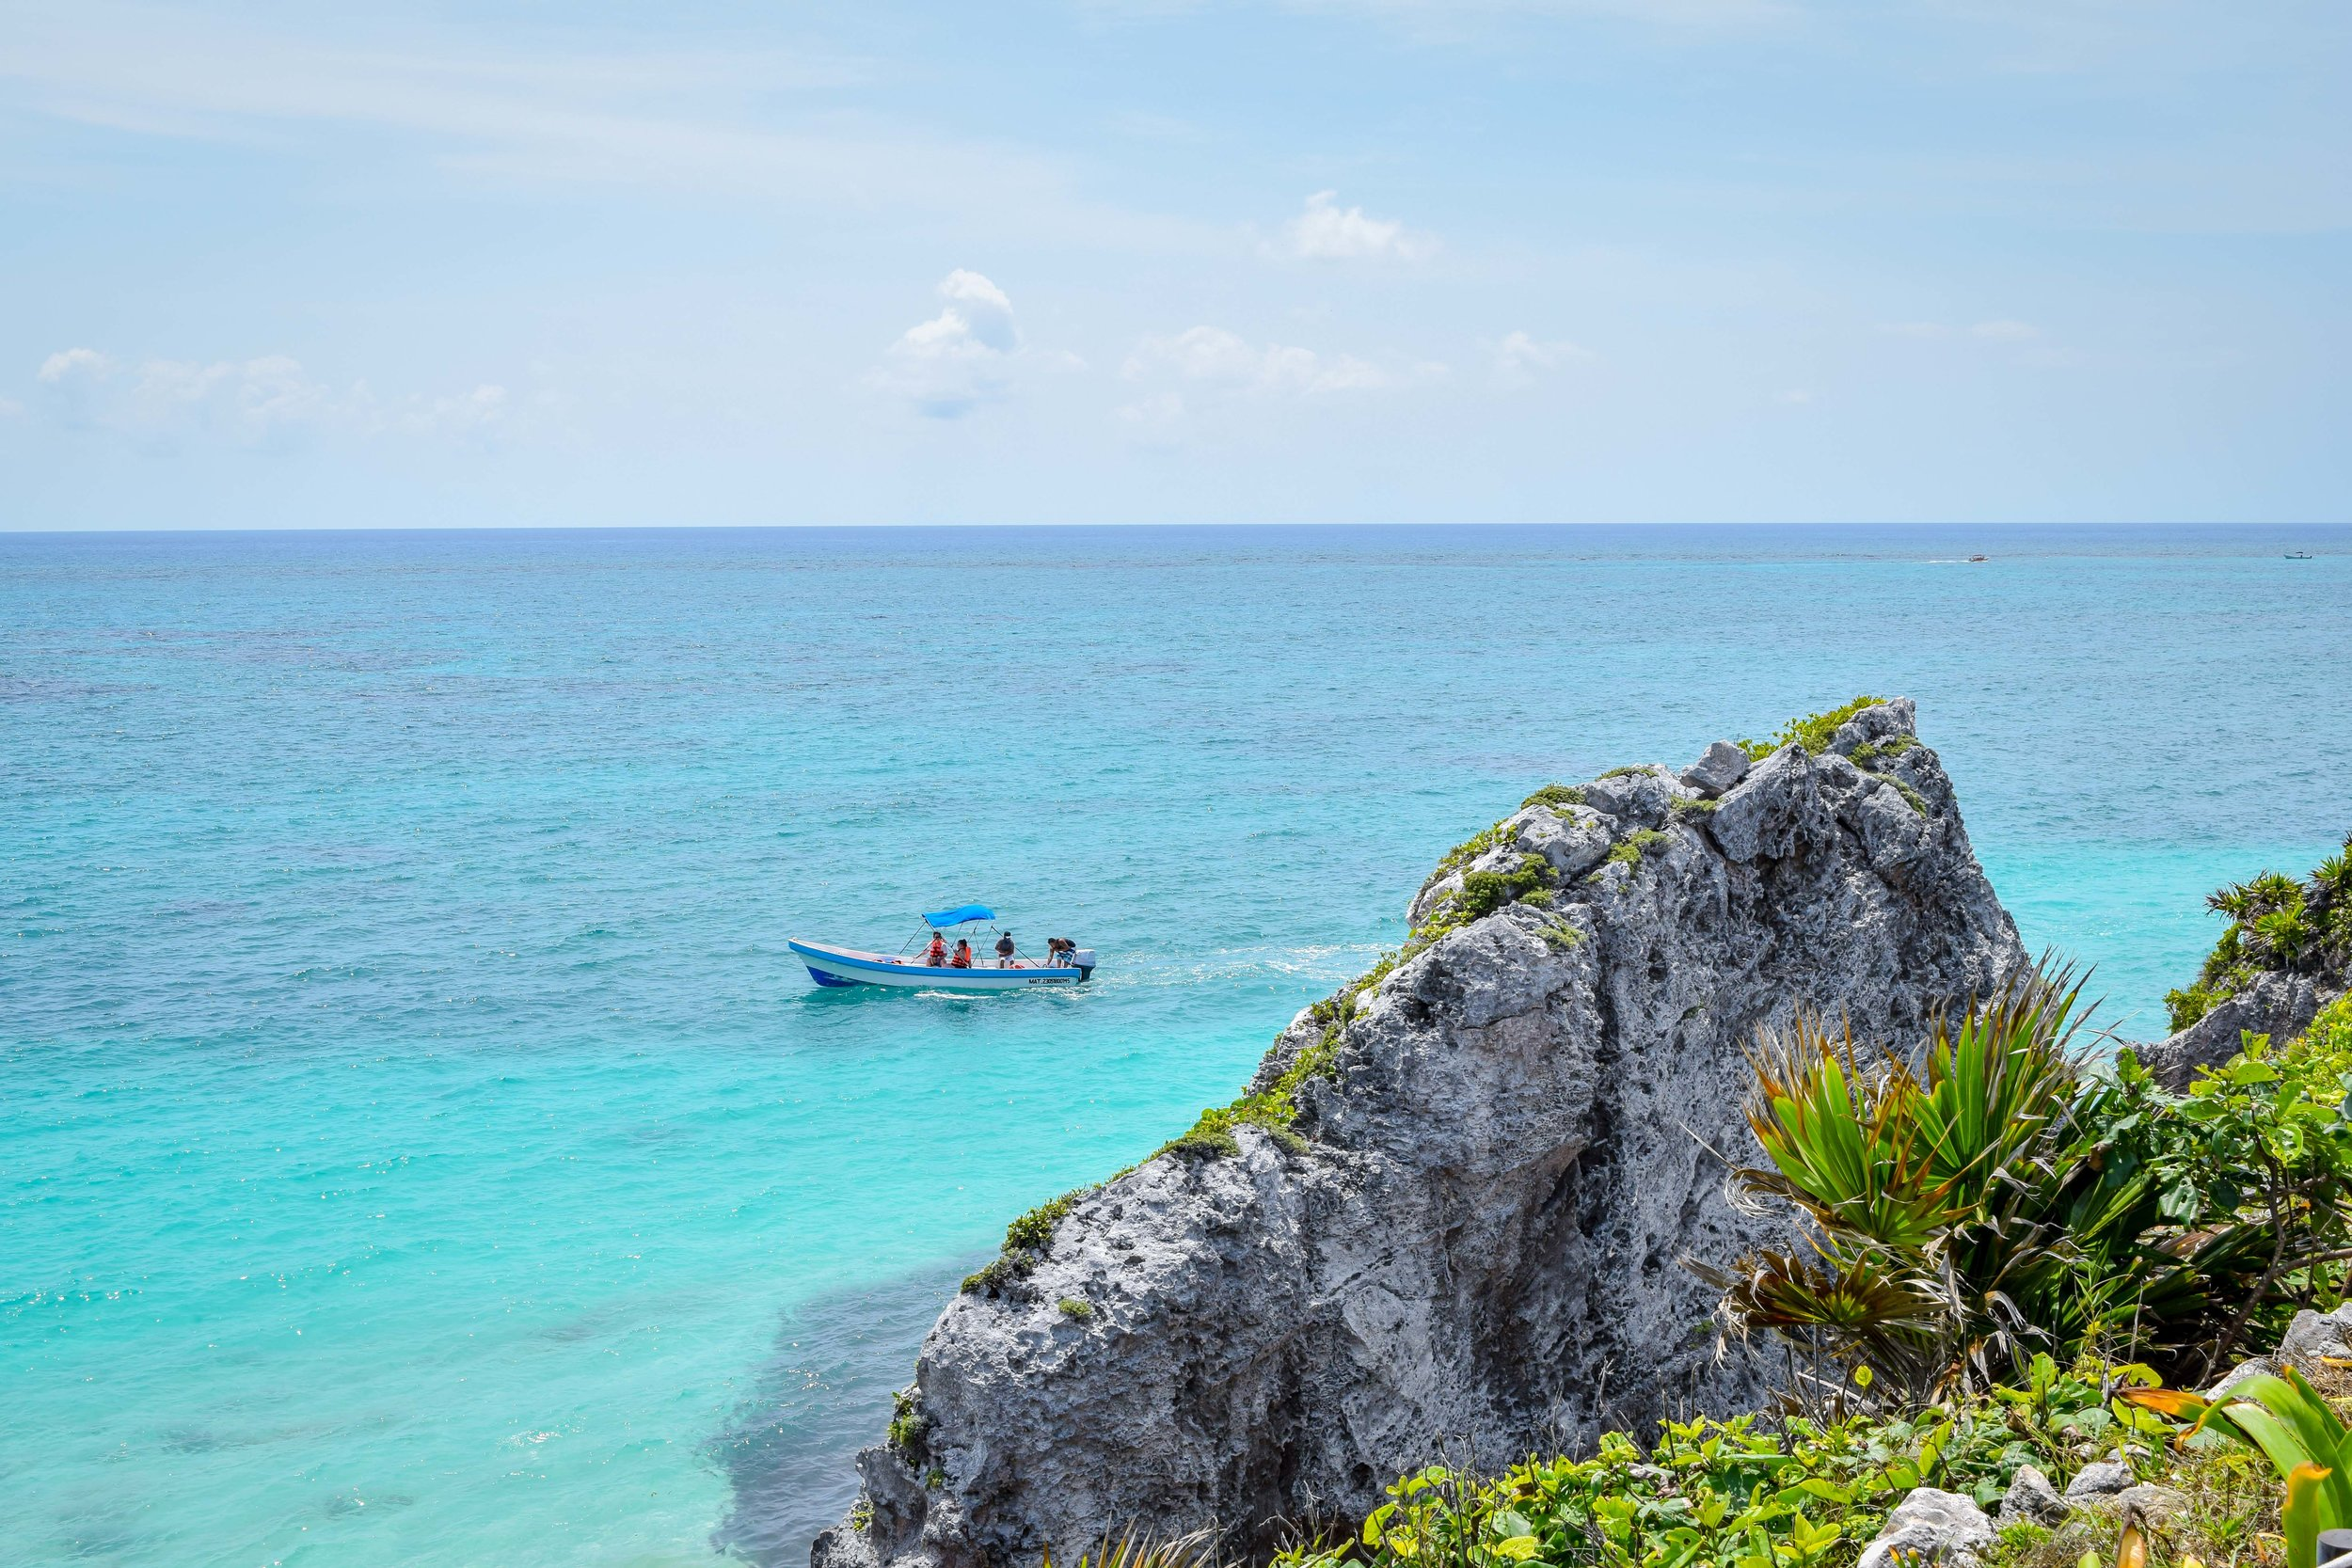 Turqoiuse waters and a boat off the coast of Tulum